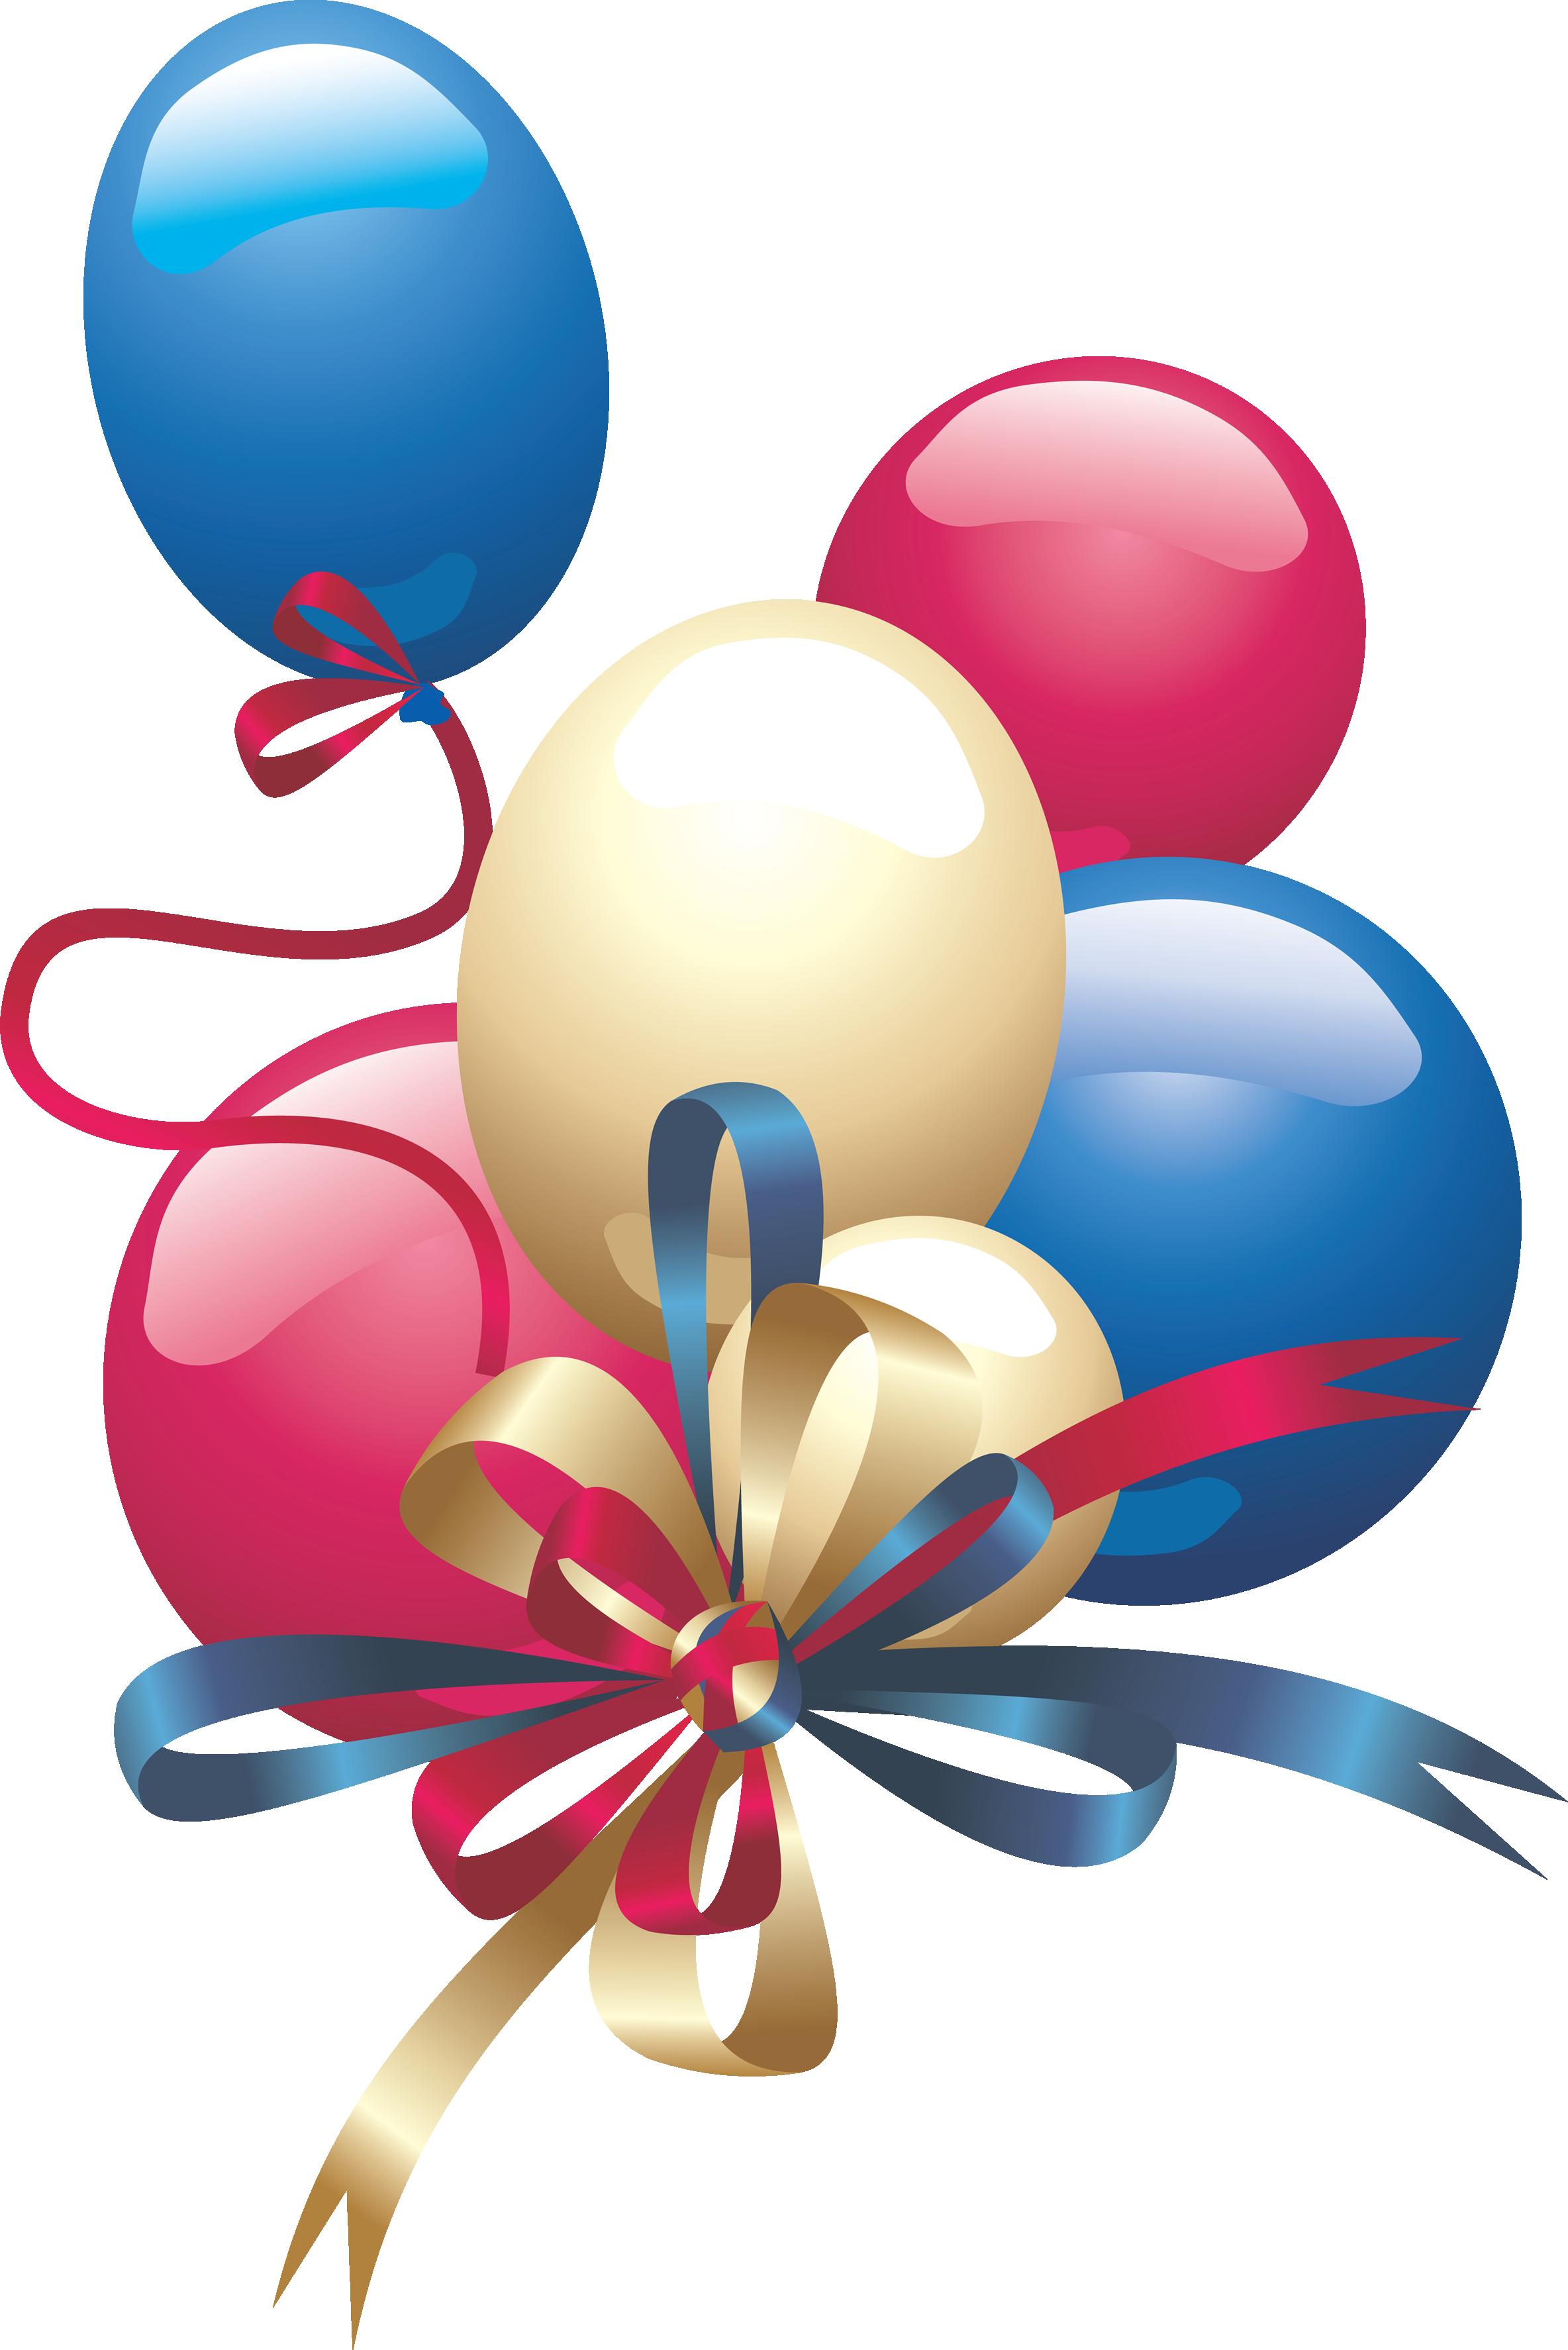 Balloons PNG image - Ballons PNG